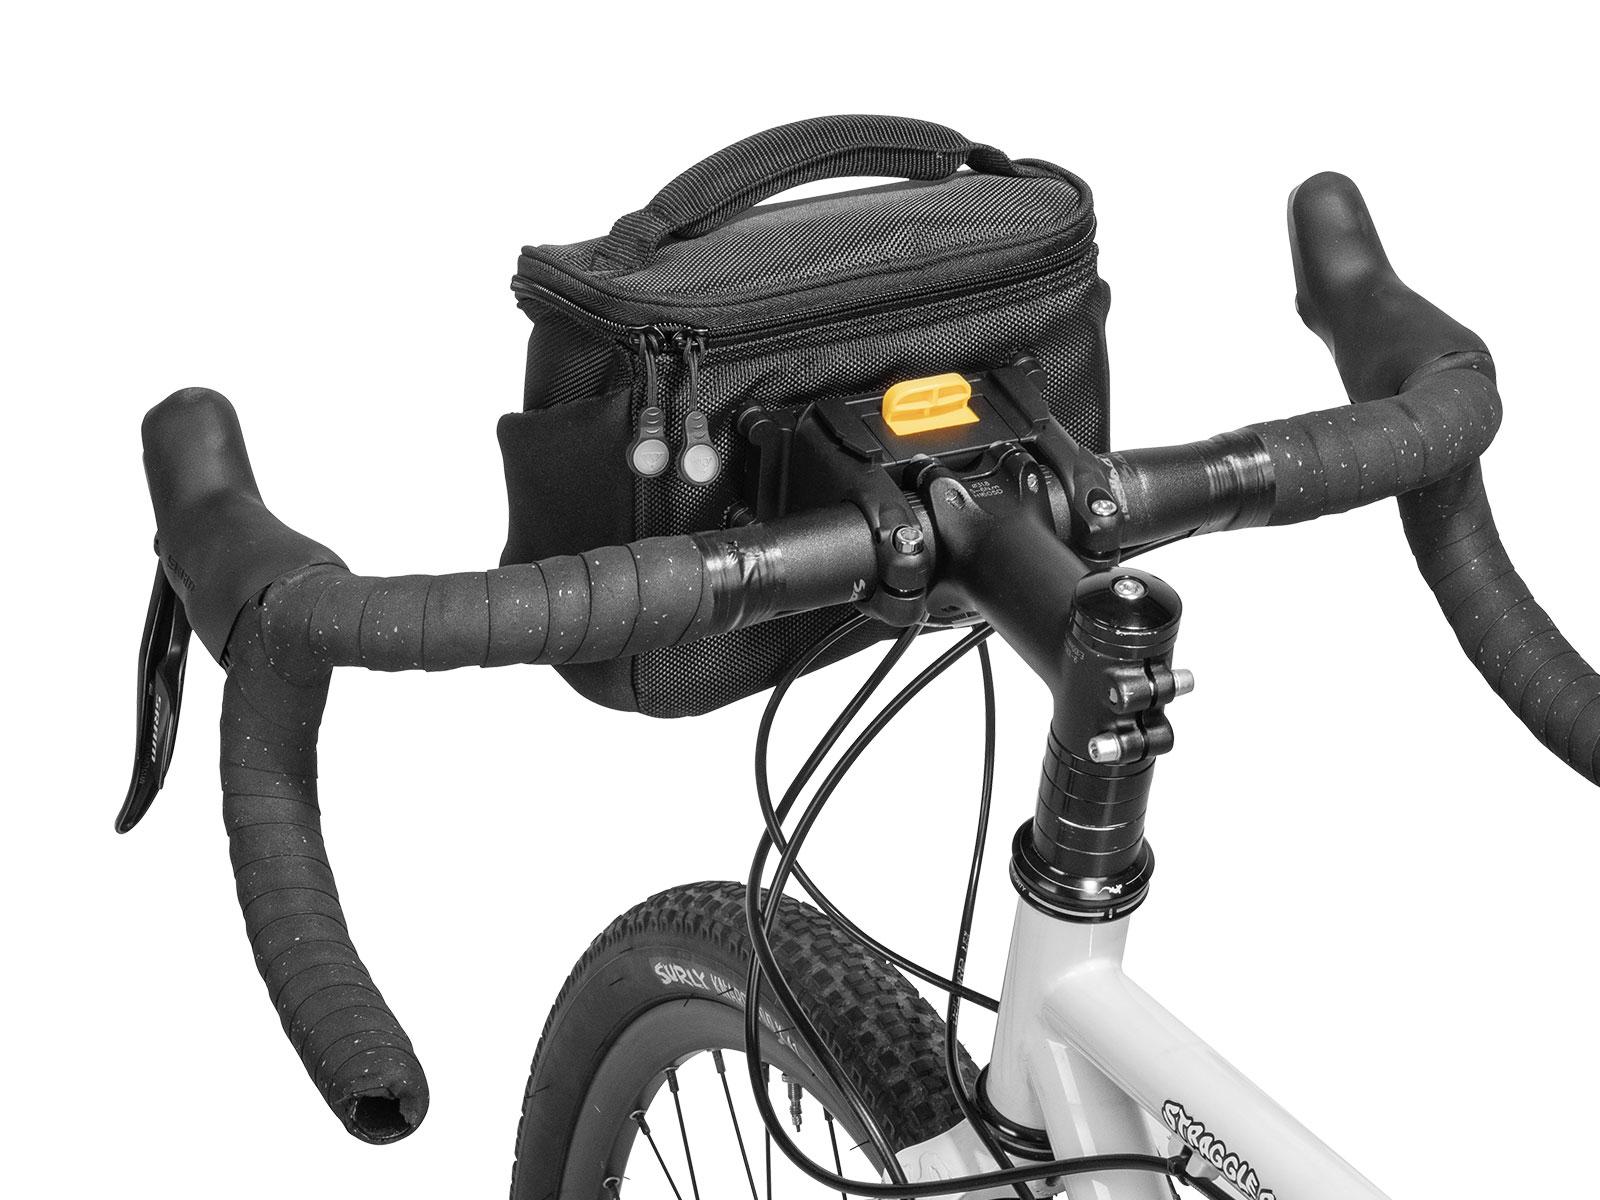 Bolsa de Guidão Topeak Compact Handlebar Bag - TT3020B  - IBIKES